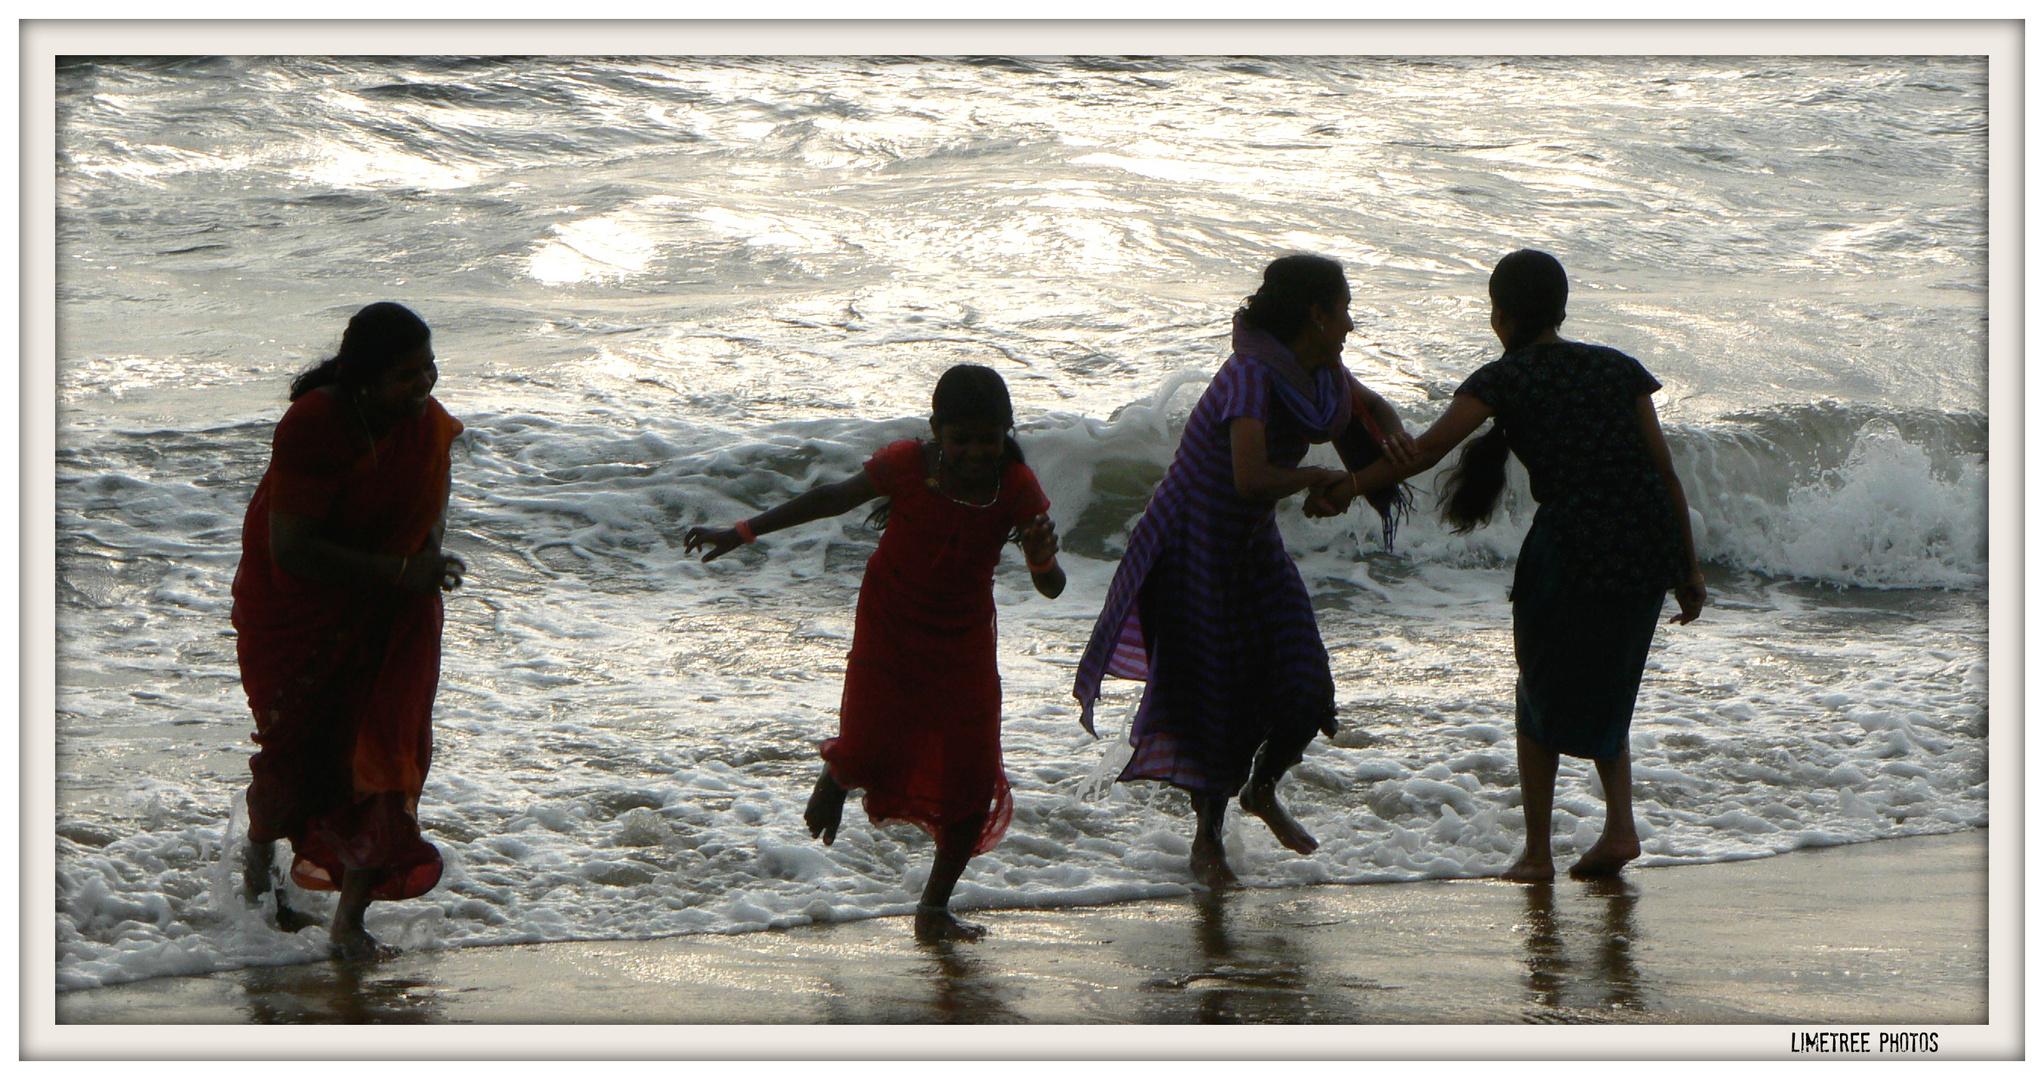 Lot's of fun at the Indian Ocean